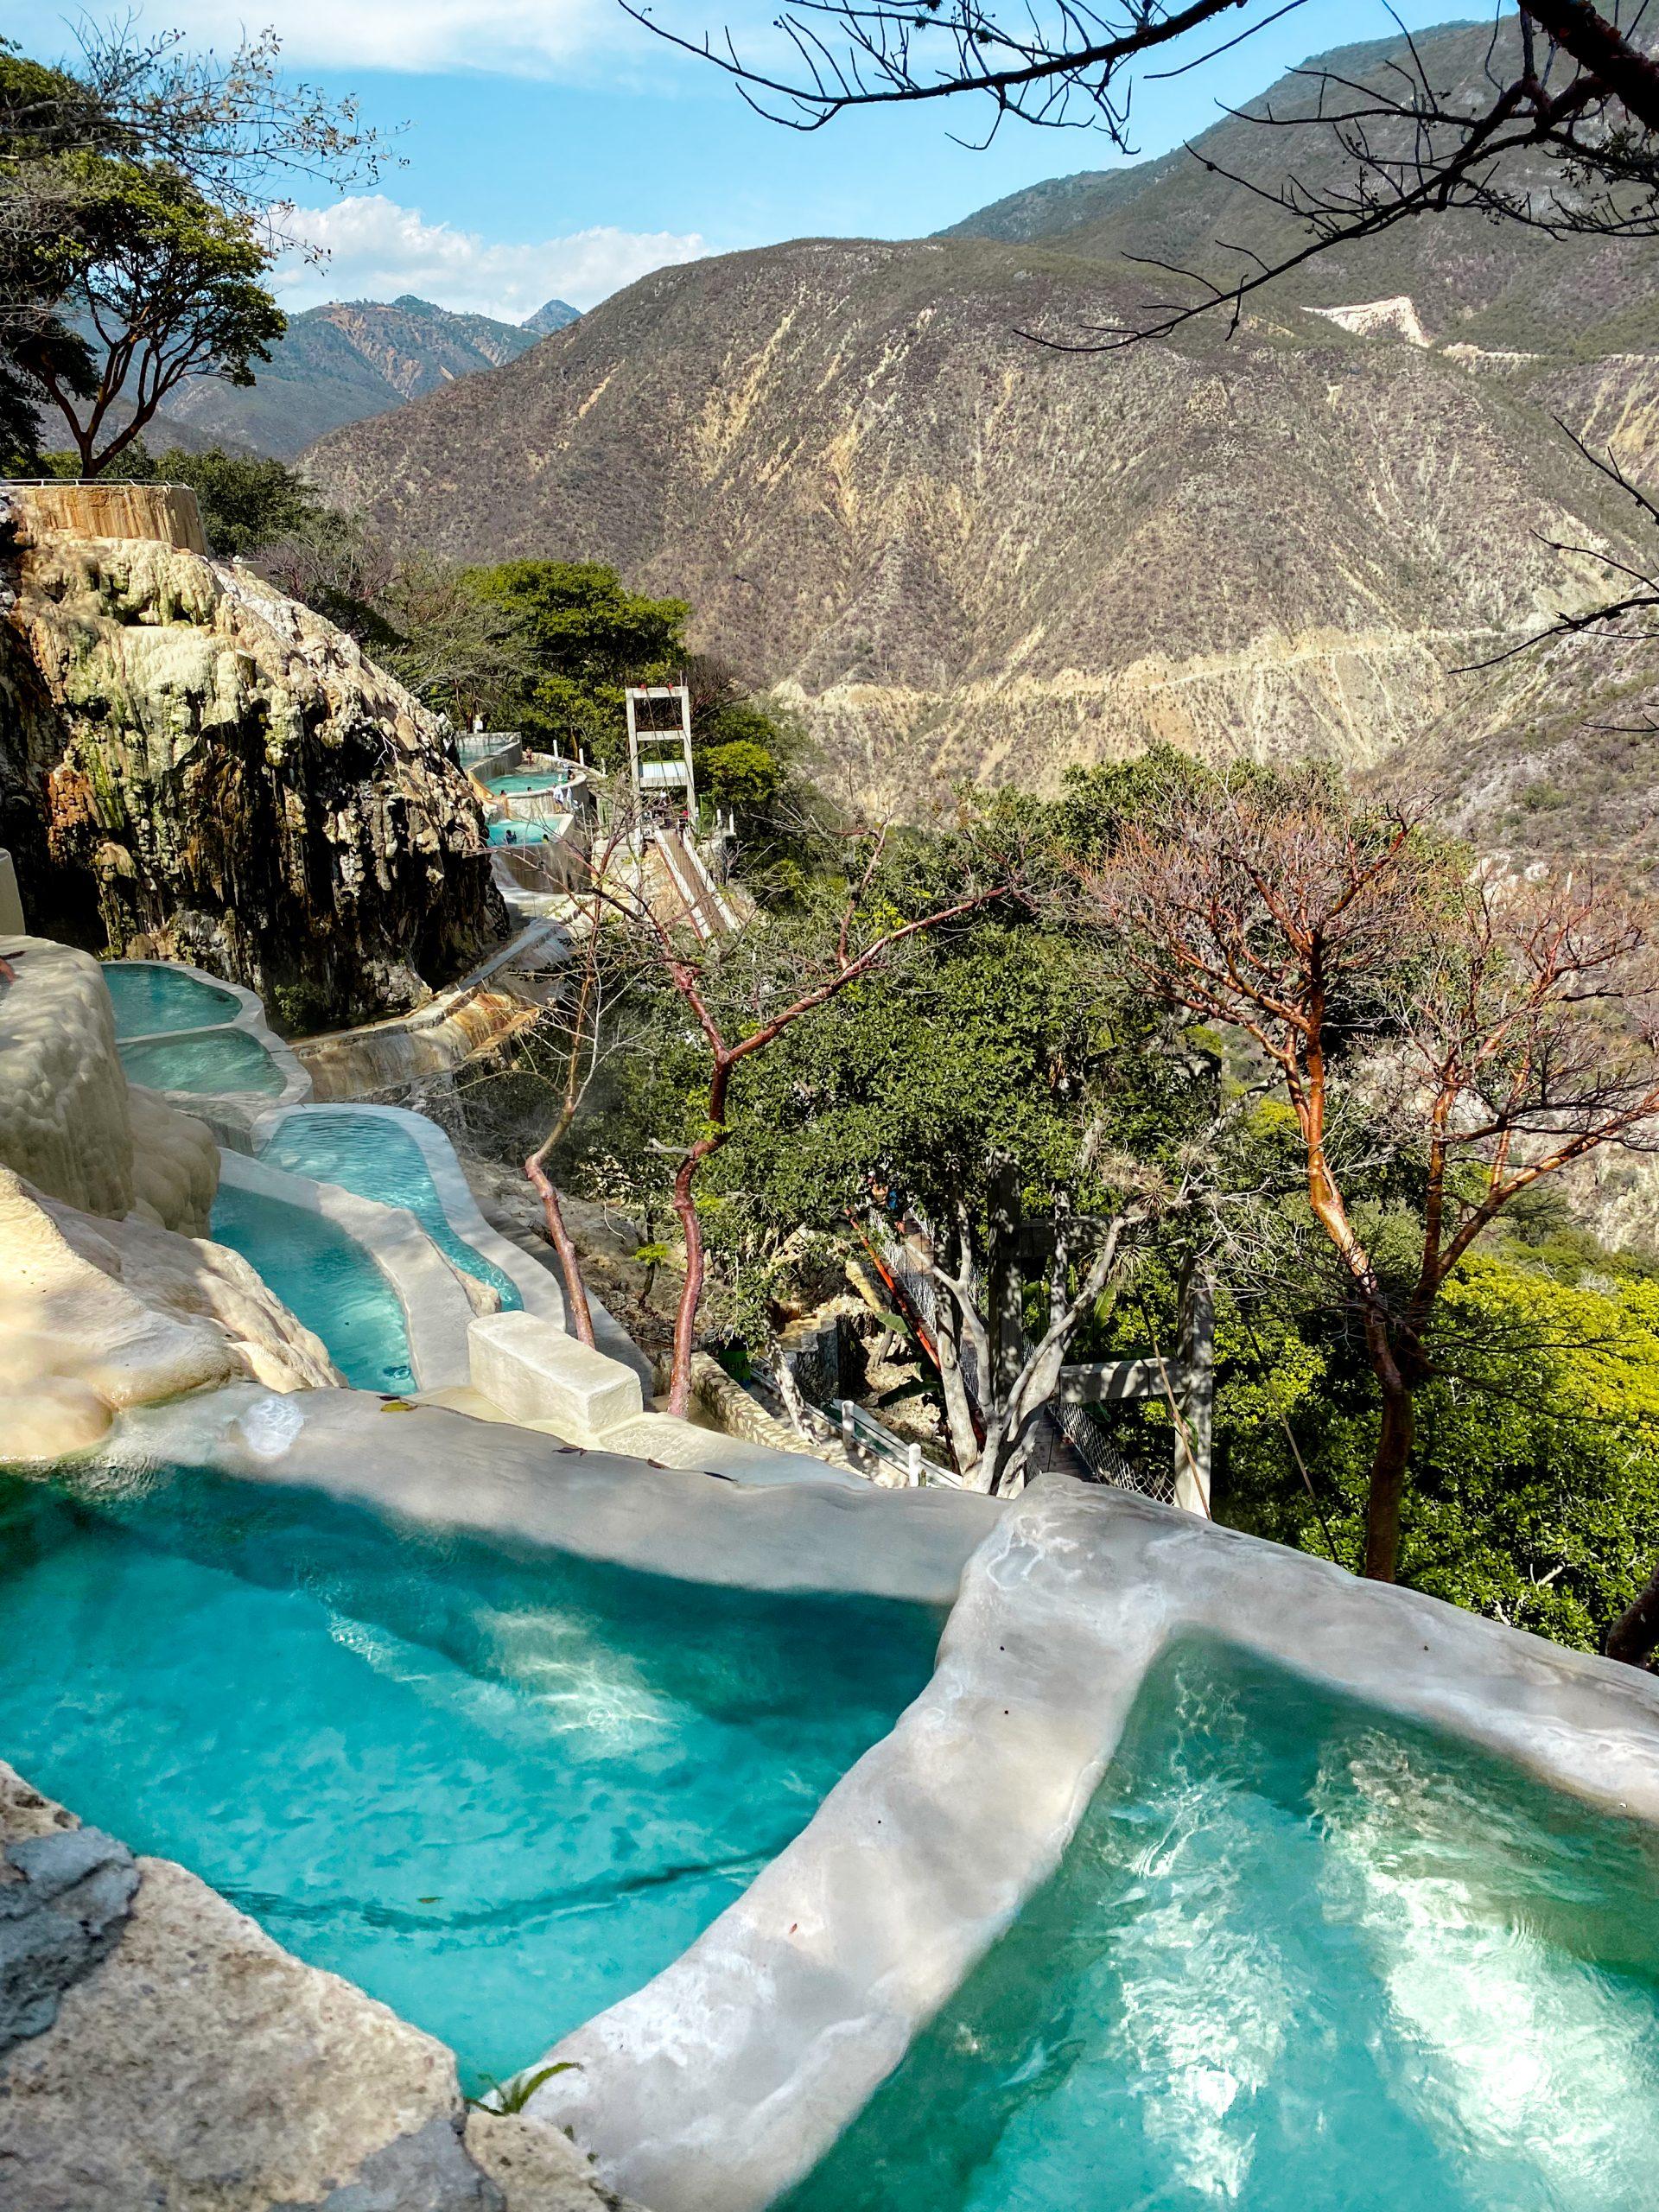 grutas tolantongo thermal pool mezquital valley canyon hidalgo mexico hot springs